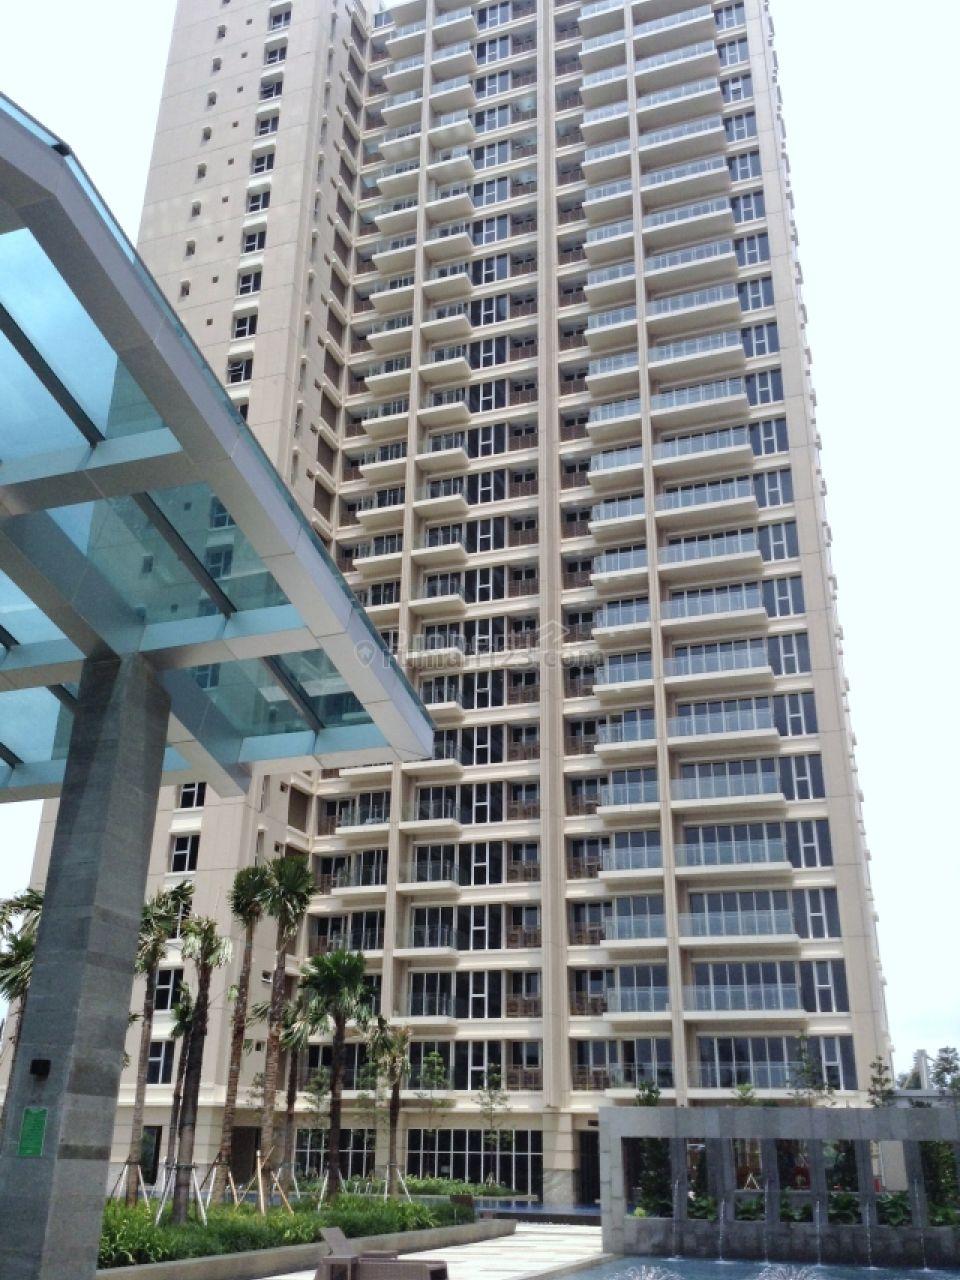 Unit 3BR Tower Amala Pondok Indah Residences, Lantai 9, DKI Jakarta